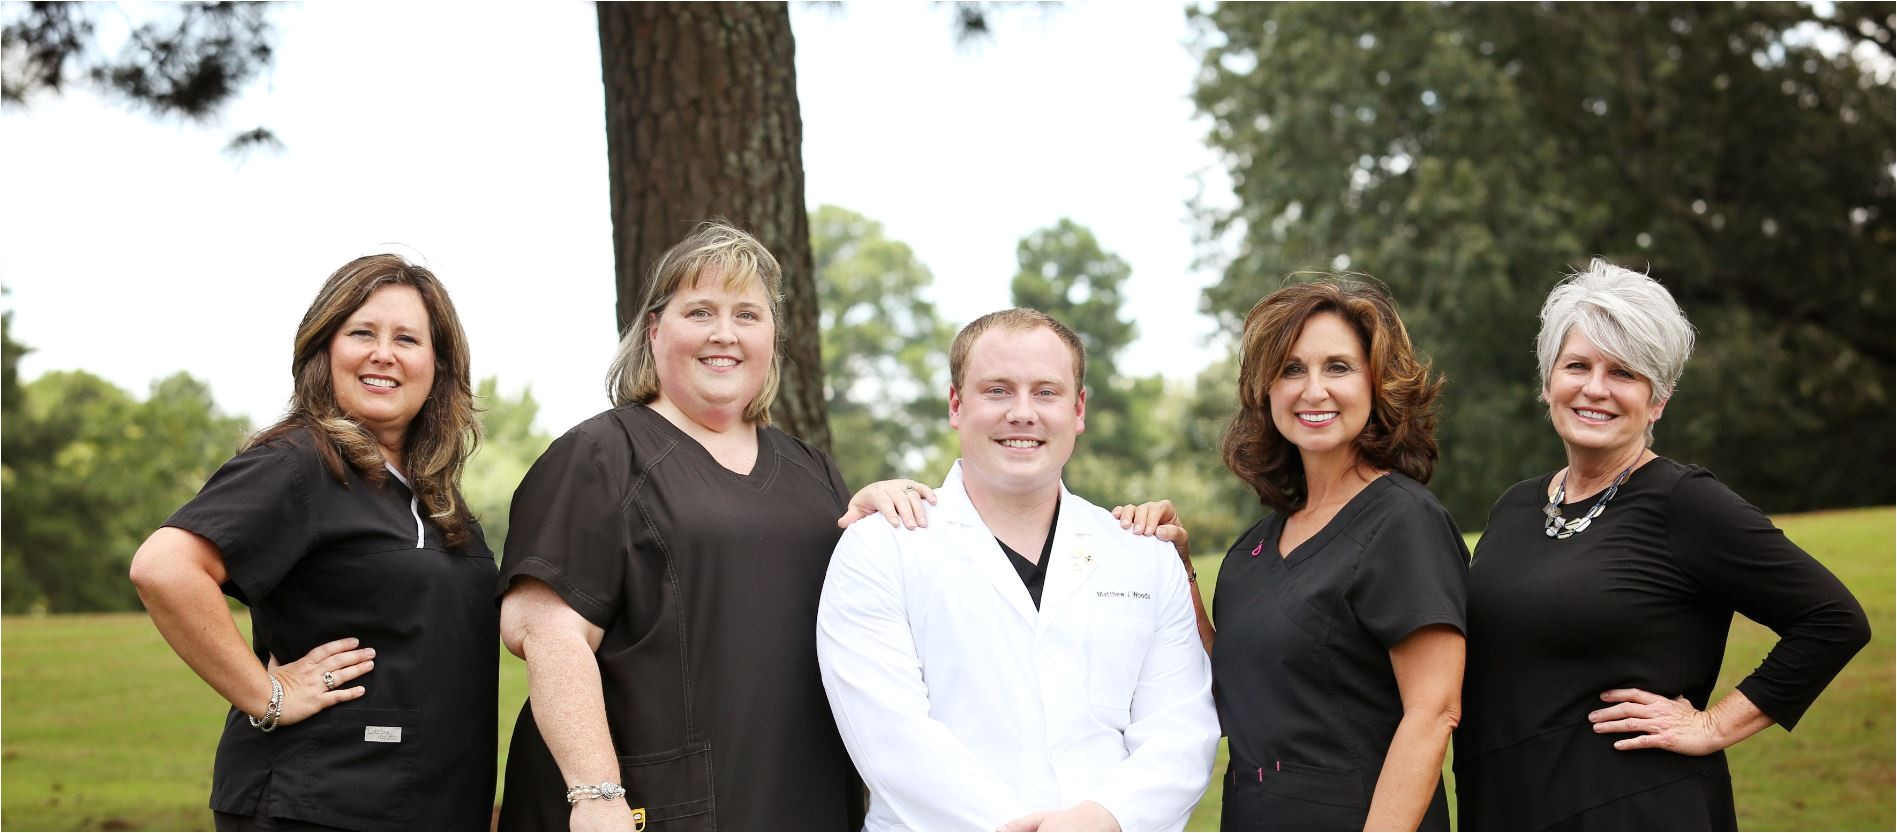 Dentist In Pine Bluff Ar Pine Bluff Ar Dentist orthodontists Pine Bluff Dental Center